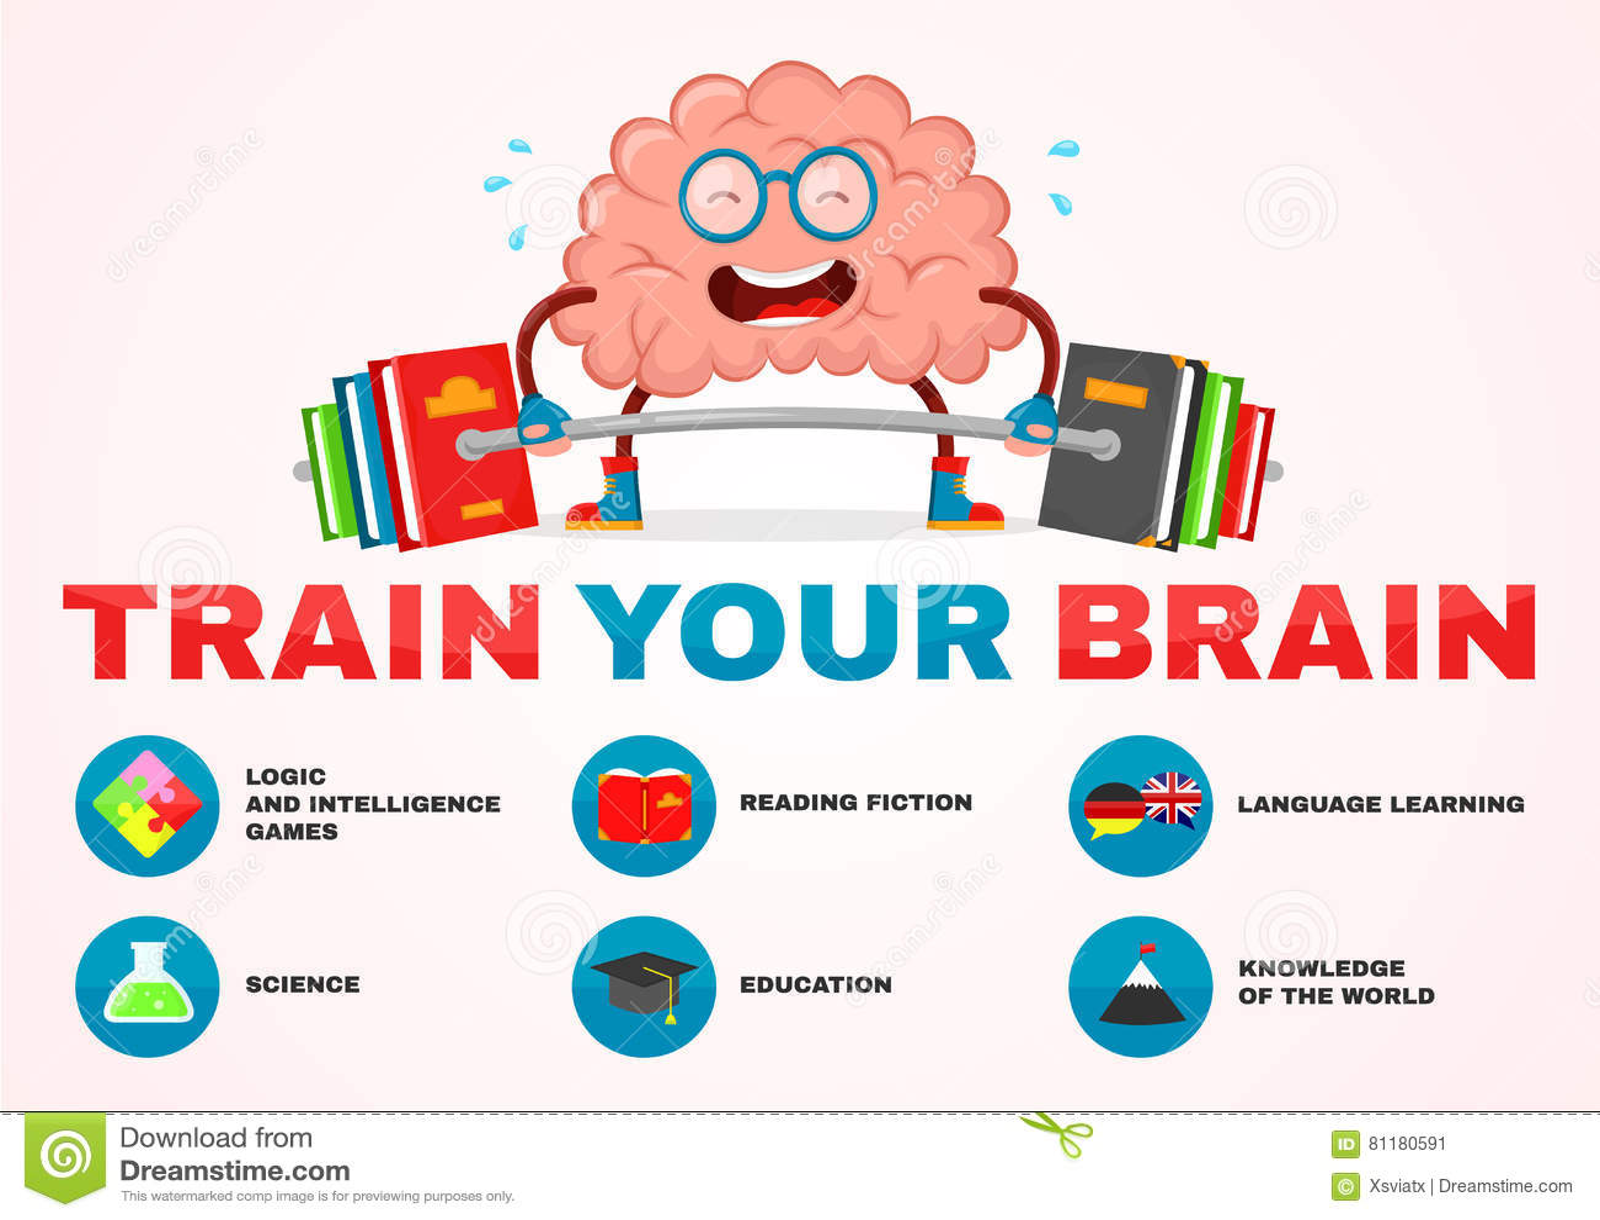 Натренируйте ваш мозг infographic характера потехи иллюстрации шаржа вектора мозга дизайн плоского творческий образование, наука,